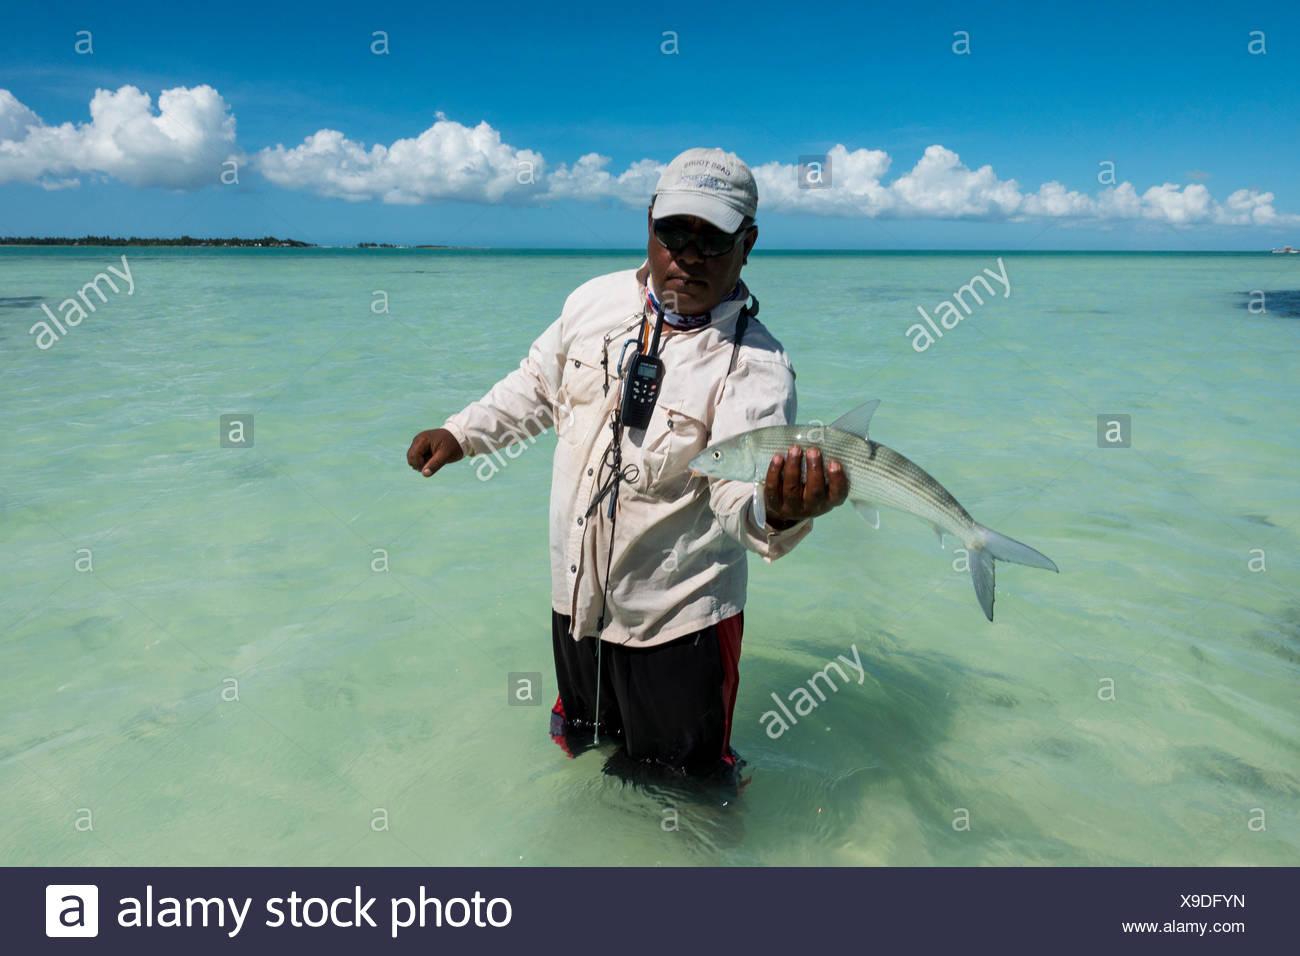 Bonefish Stock Photos & Bonefish Stock Images - Alamy